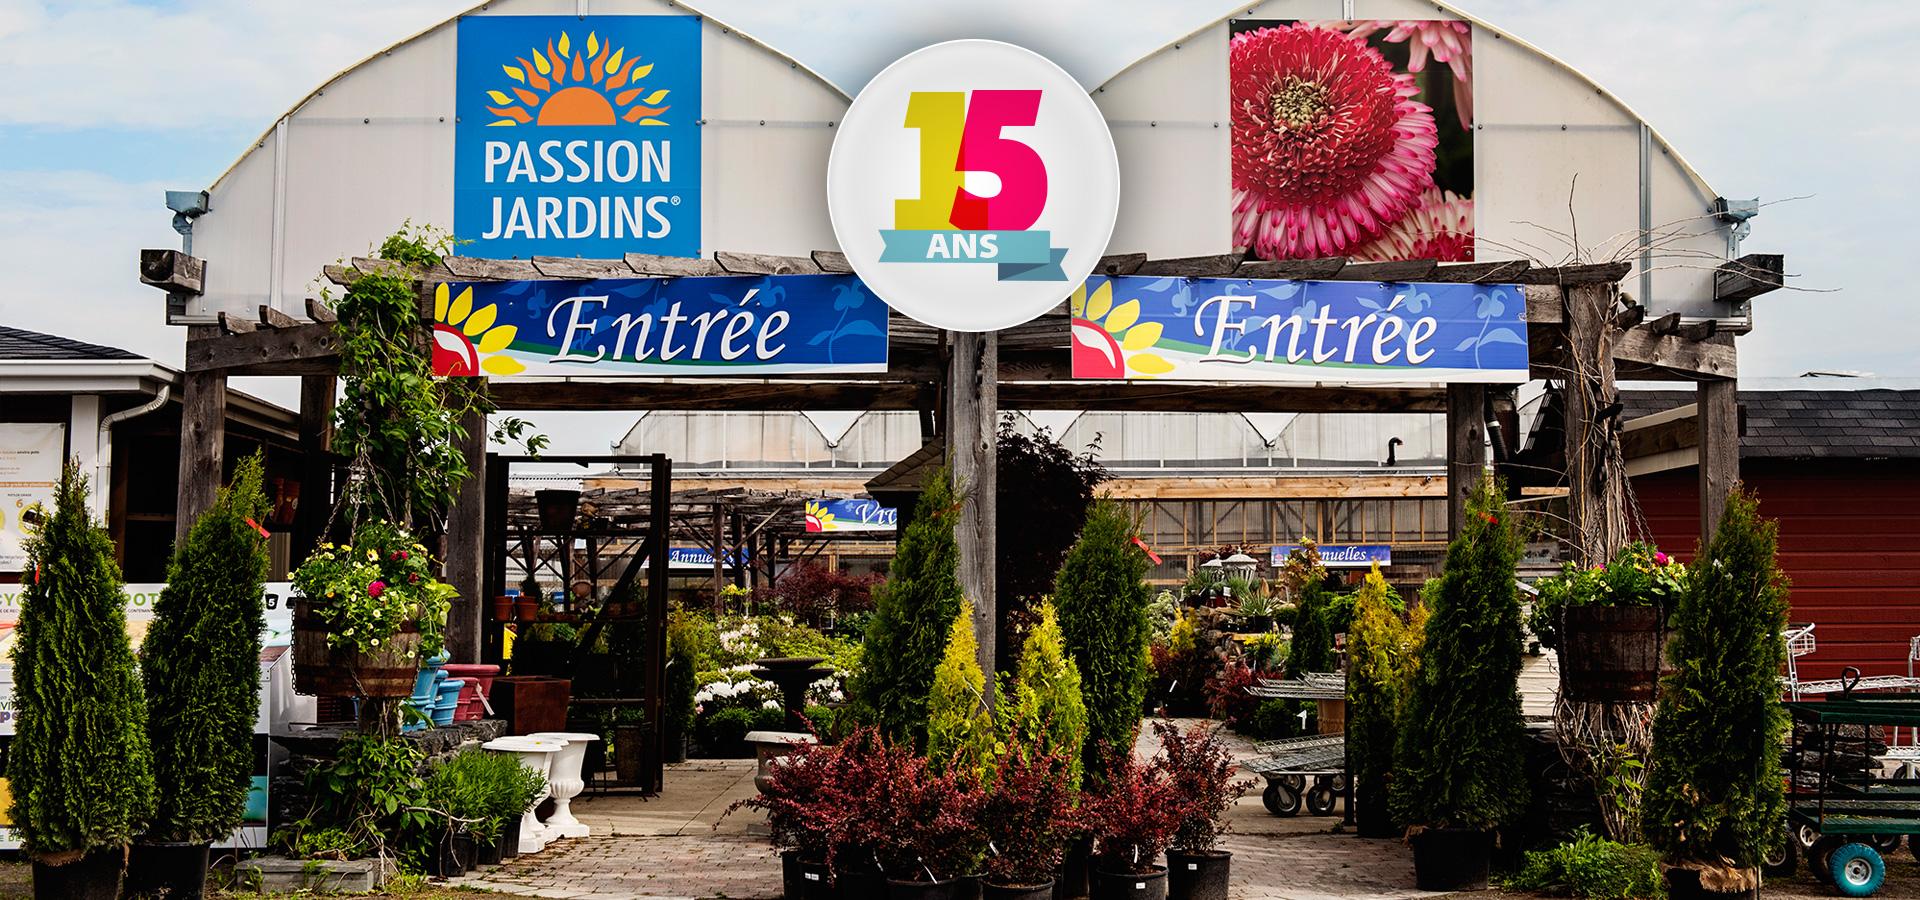 Complexe horticole bastien   passion jardins